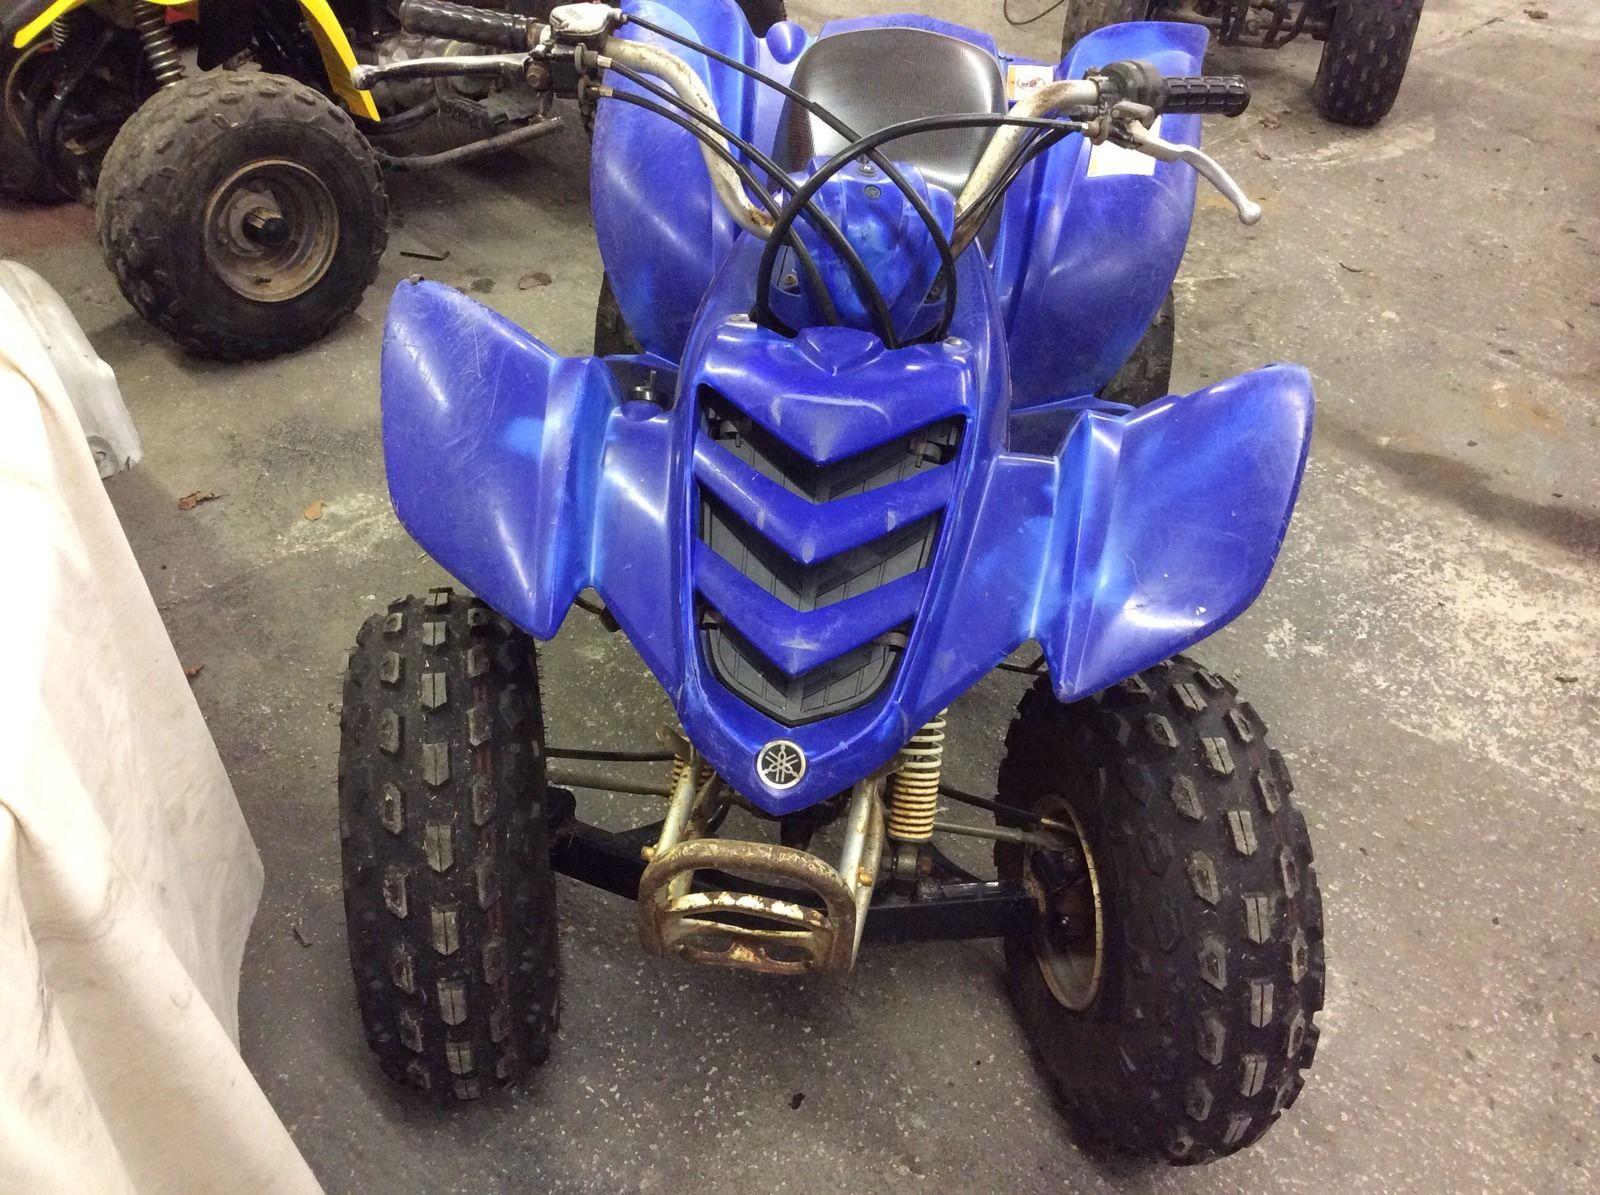 Cheap Atv For Sale >> yamaha 80cc quad,childrens quad,yamaha yfm mini raptor,semi automatic